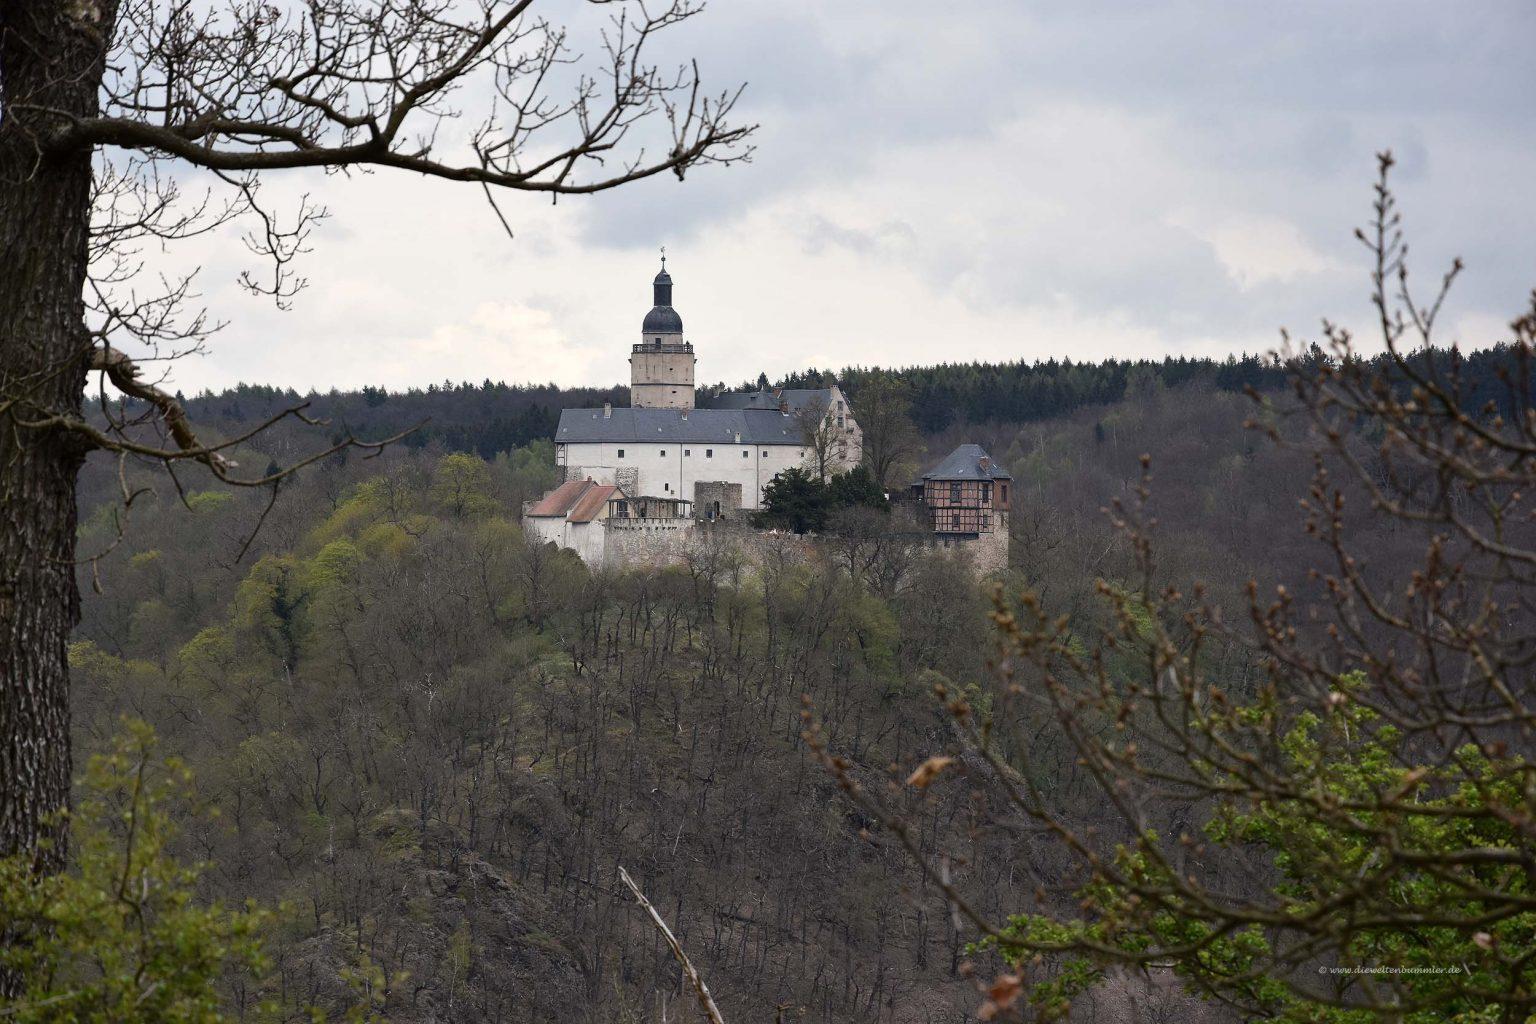 Burg Falkenstein über das Selkektal hinweg